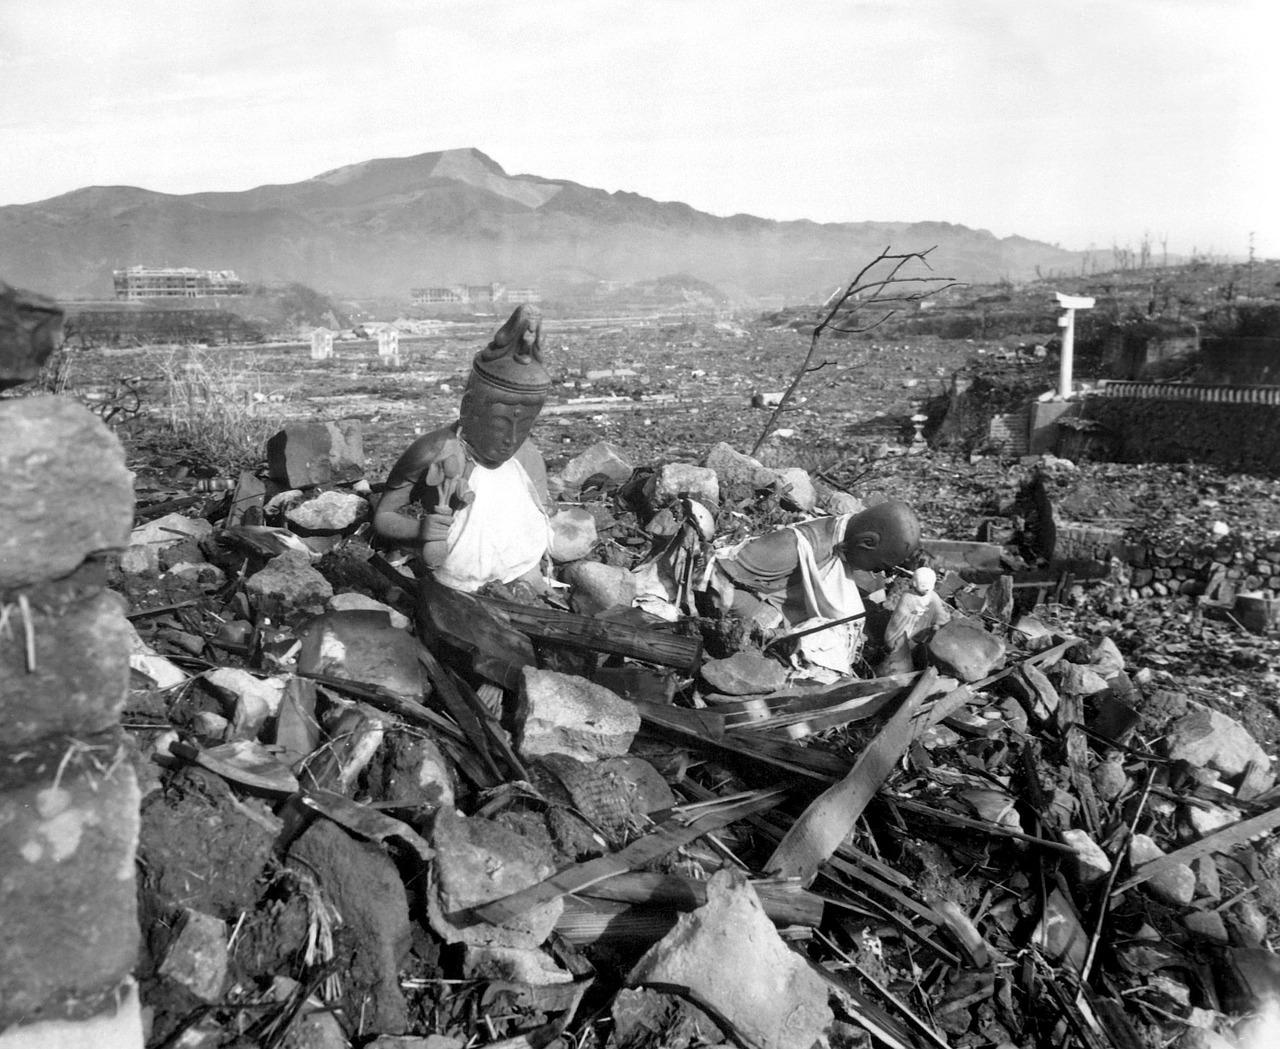 atomic-bomb-67530_1280